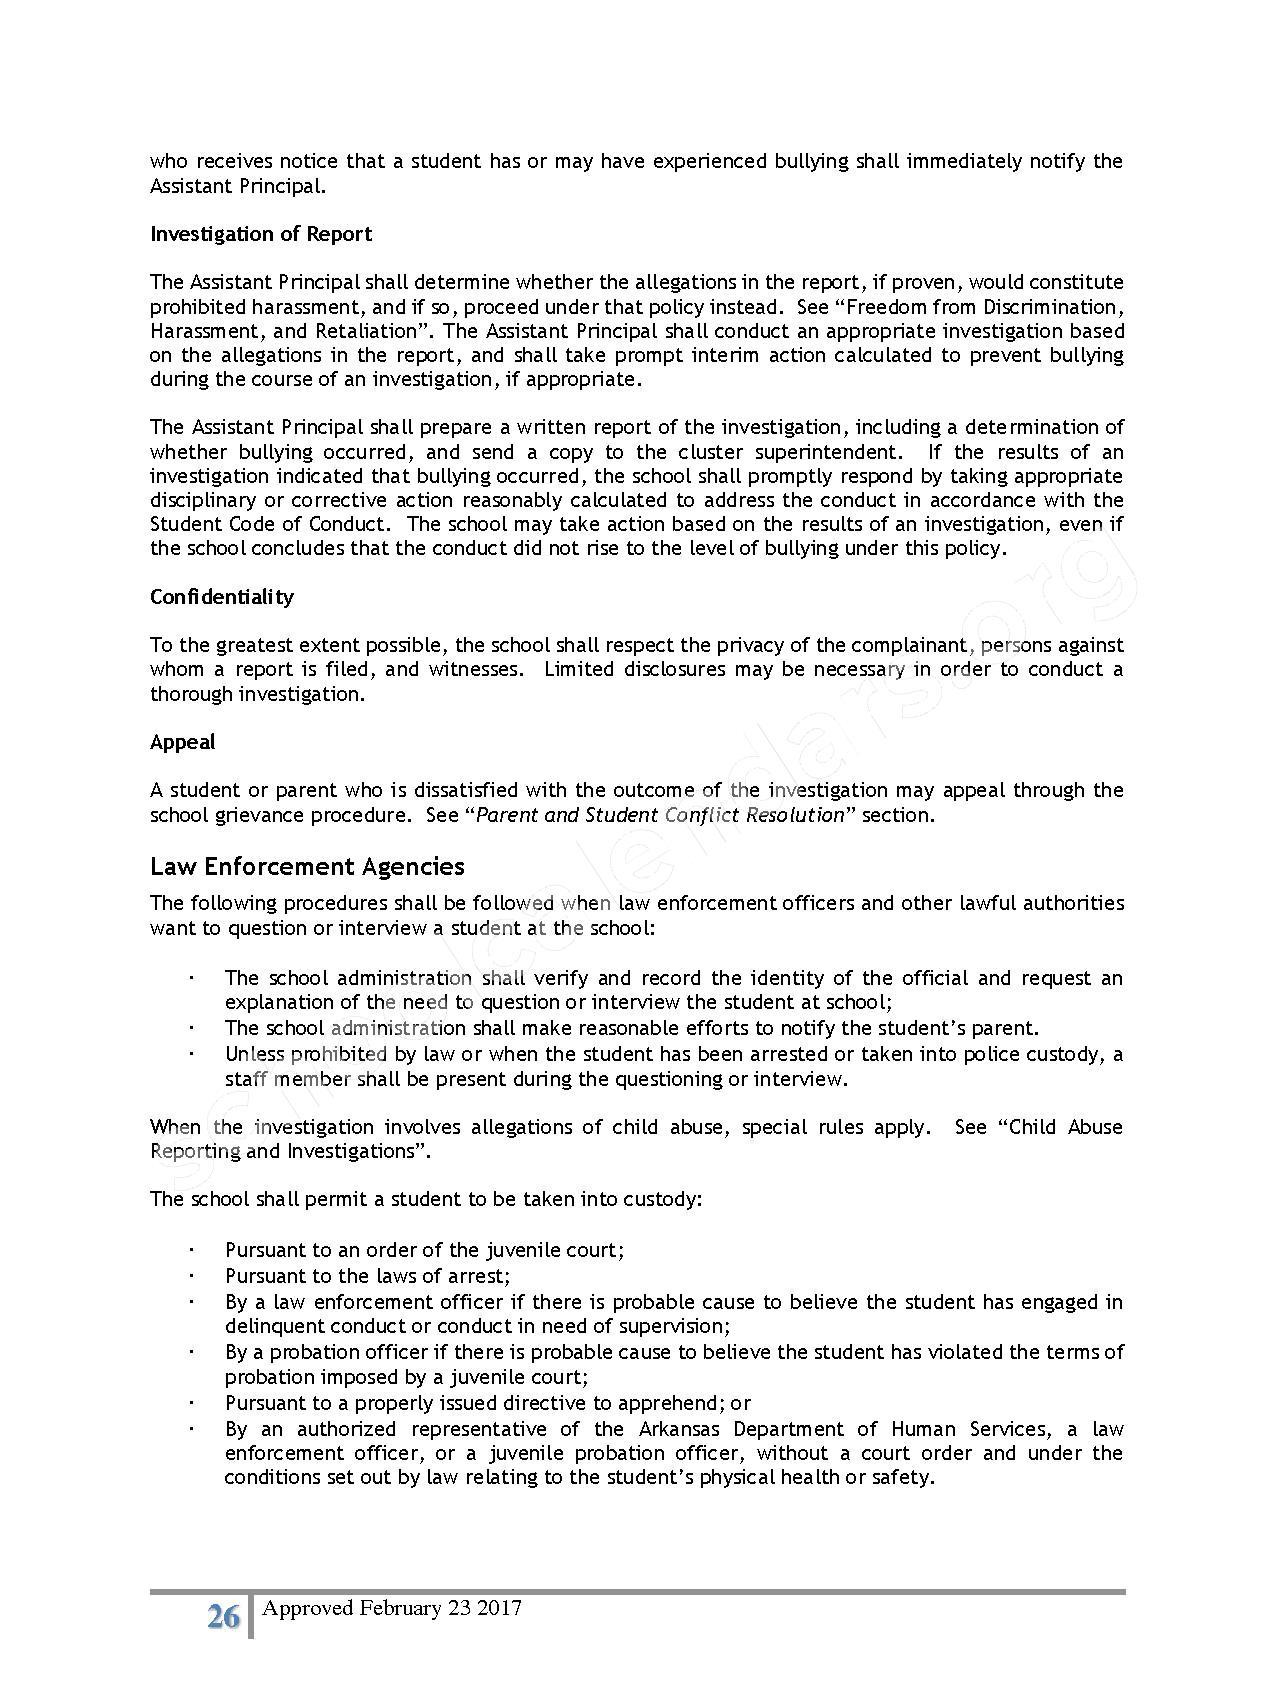 2016 - 2017 District Calendar – Lisa Academy Public Charter Schools – page 26